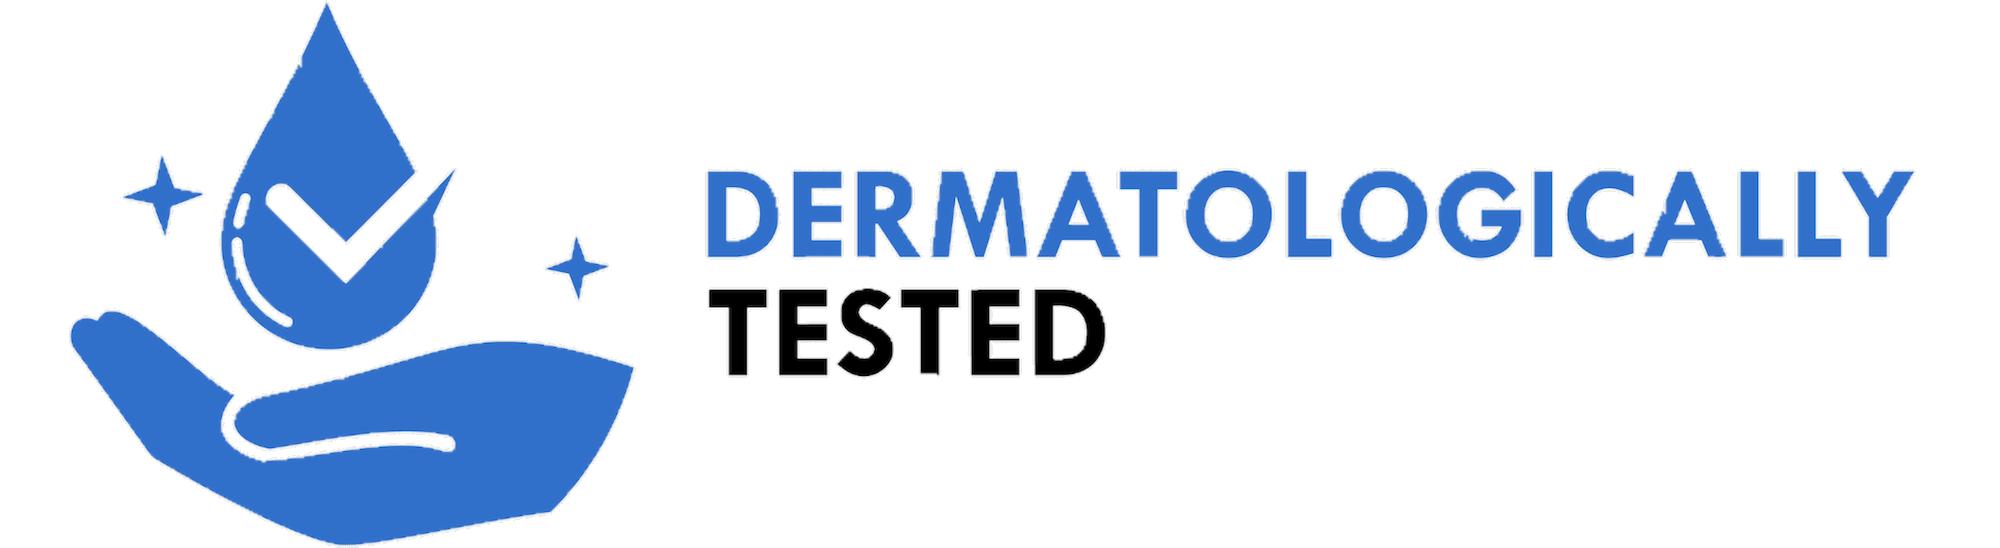 Blue dermatologically or dermatologist tested certificate symbol